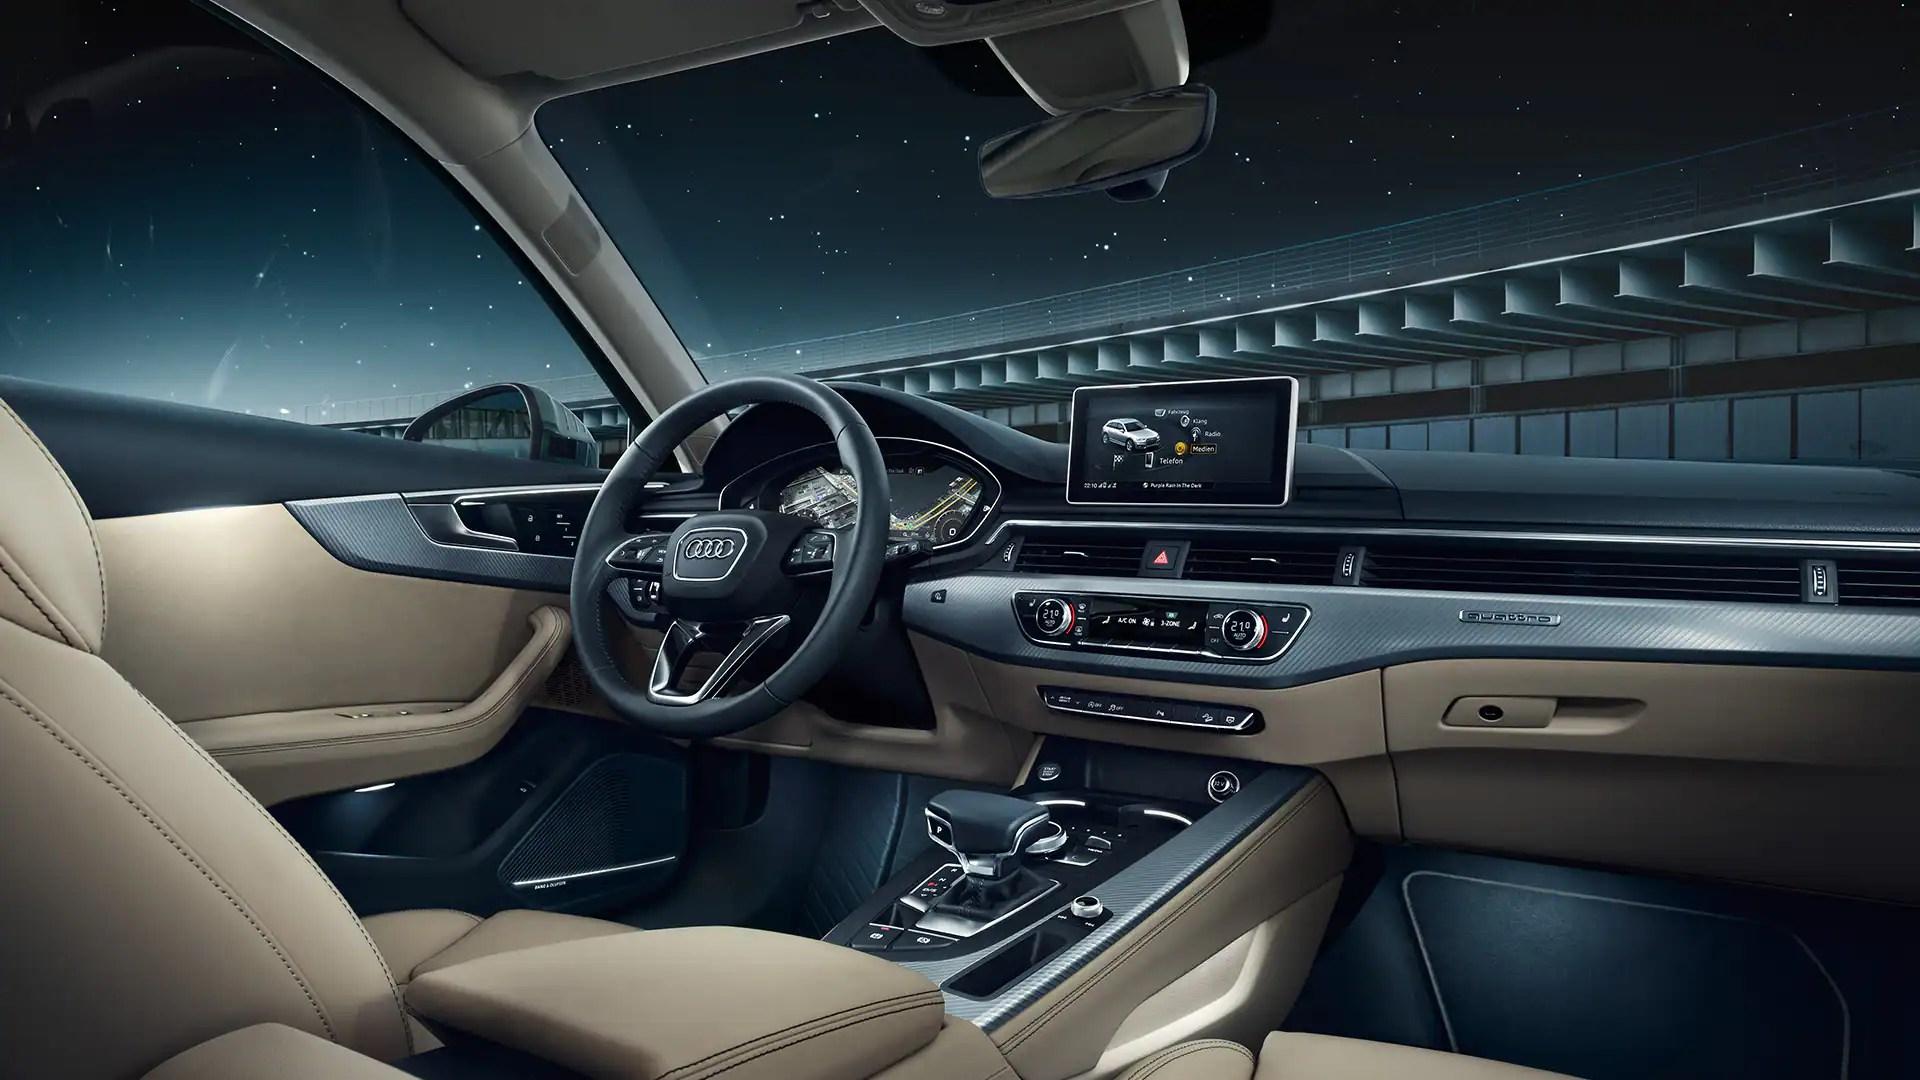 hight resolution of the a4 allroad quattro interior european model shown